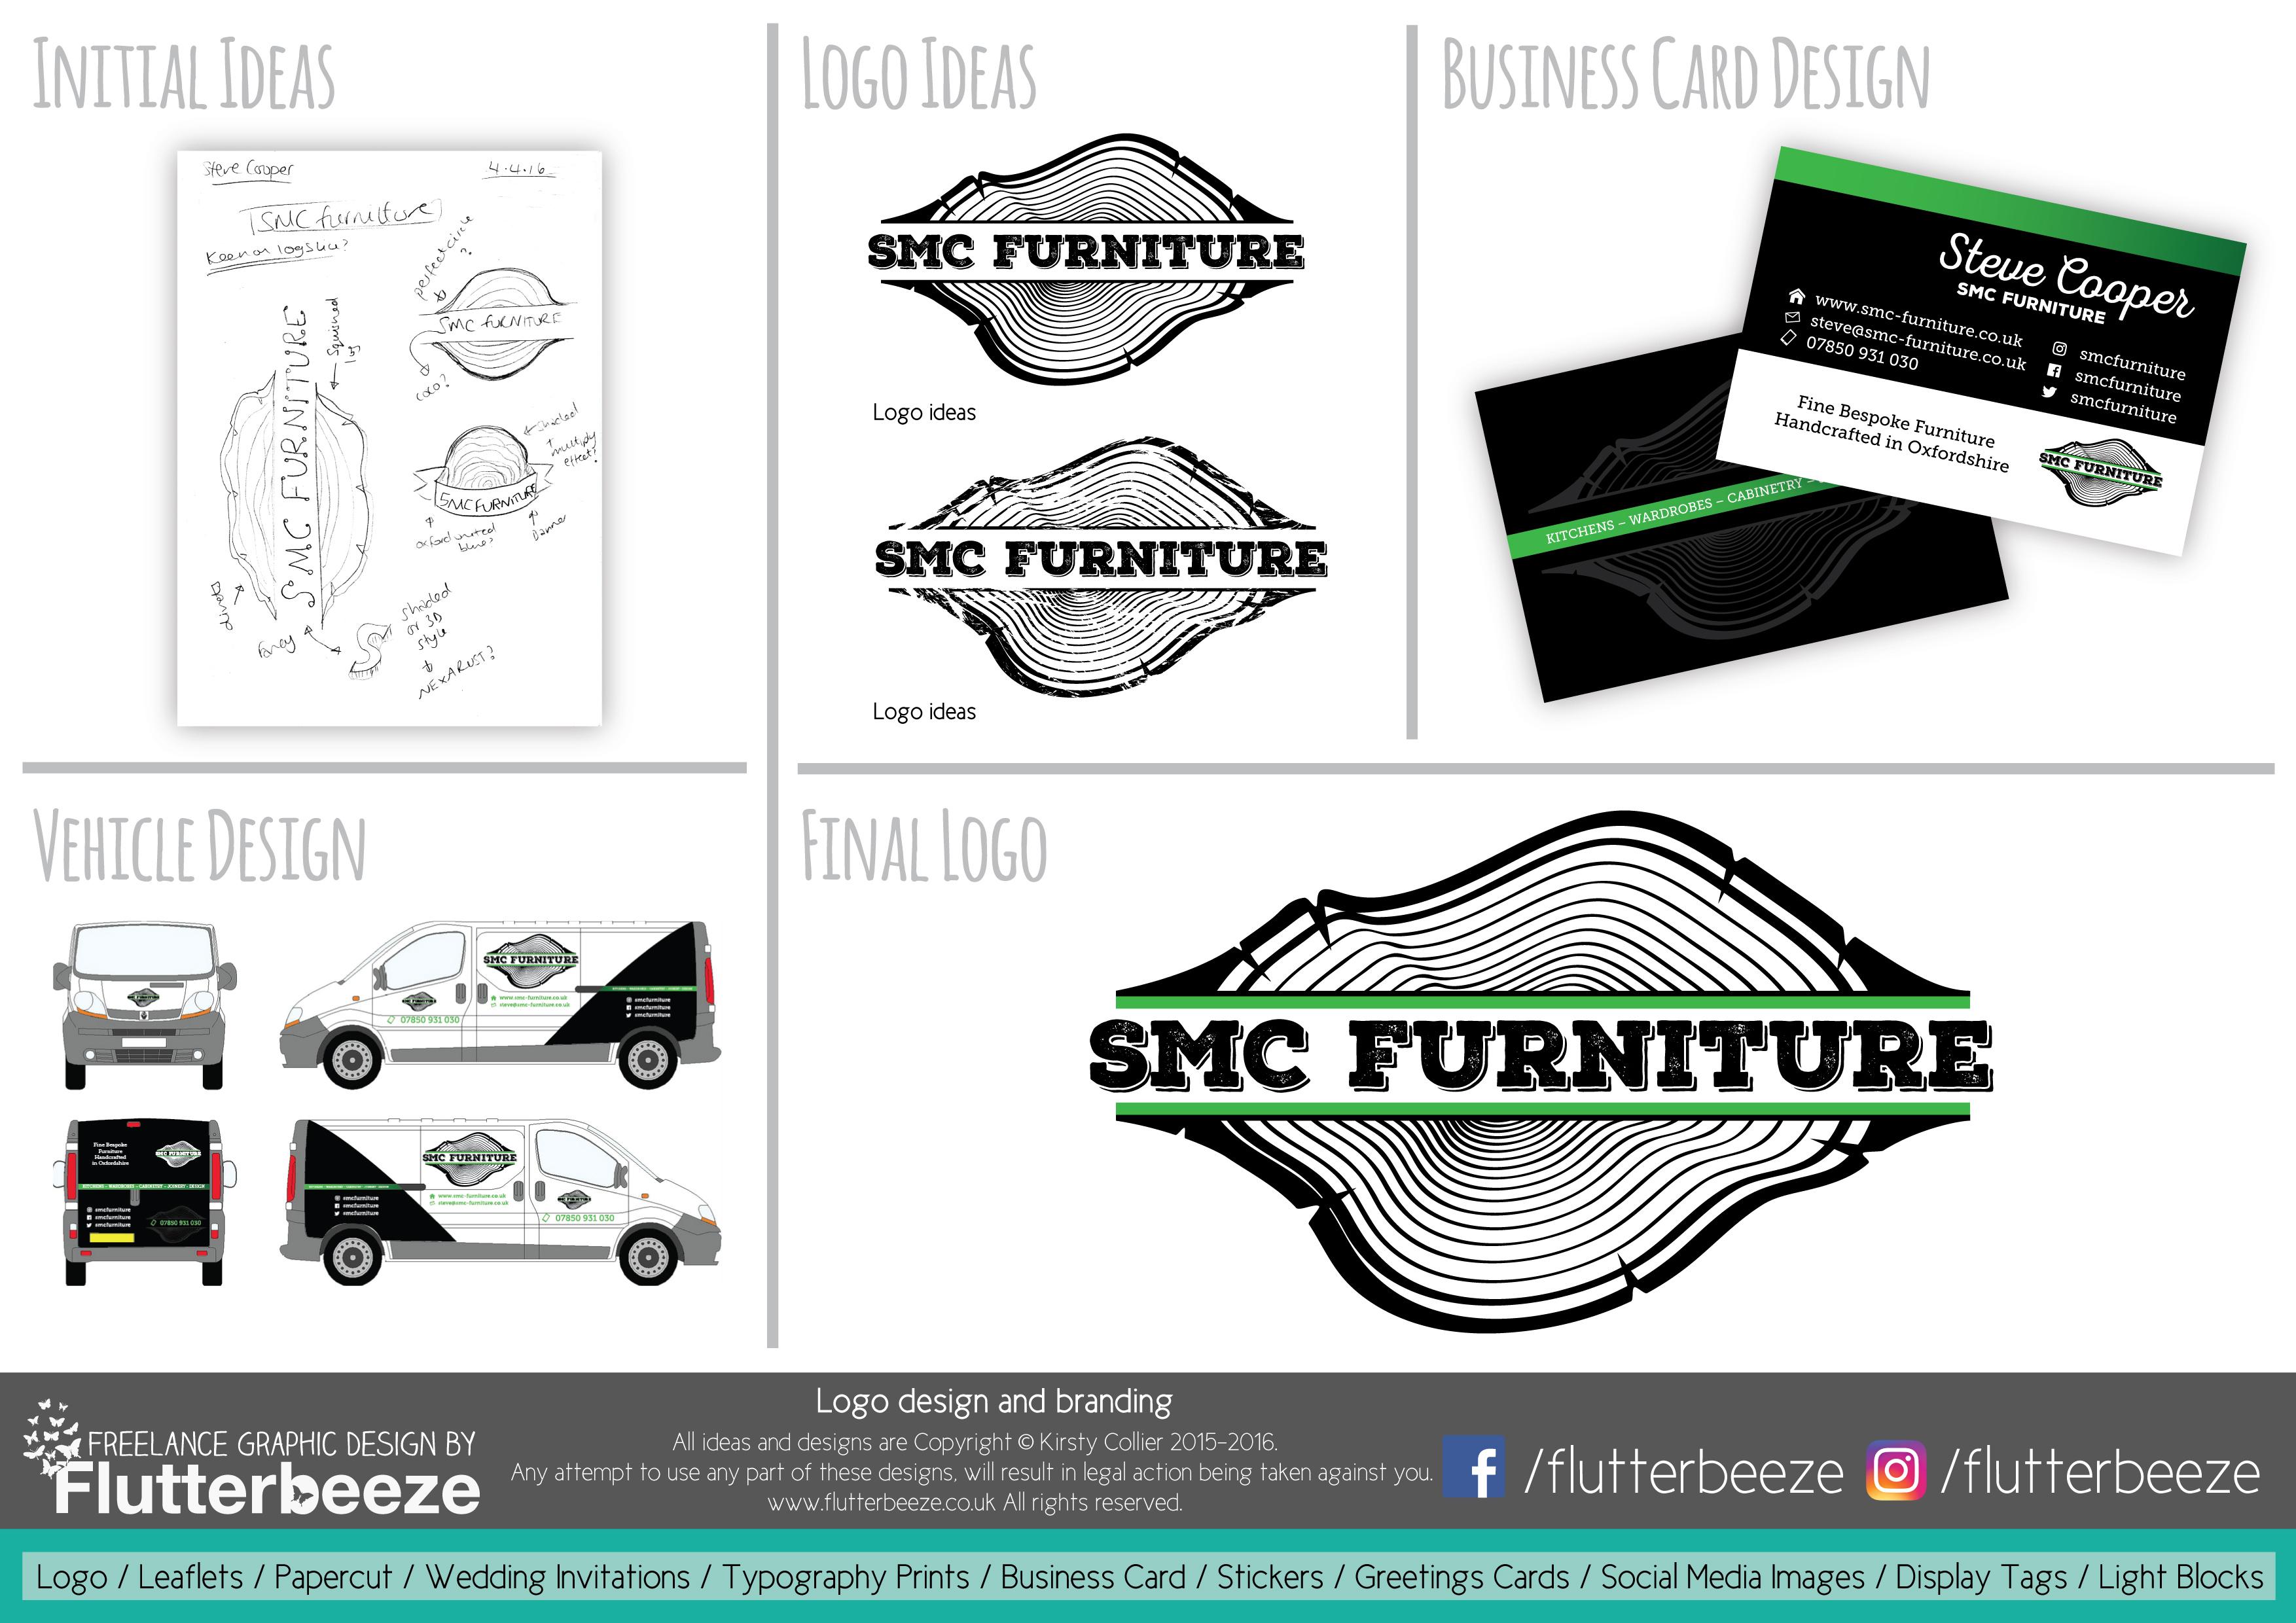 SMC Furniture